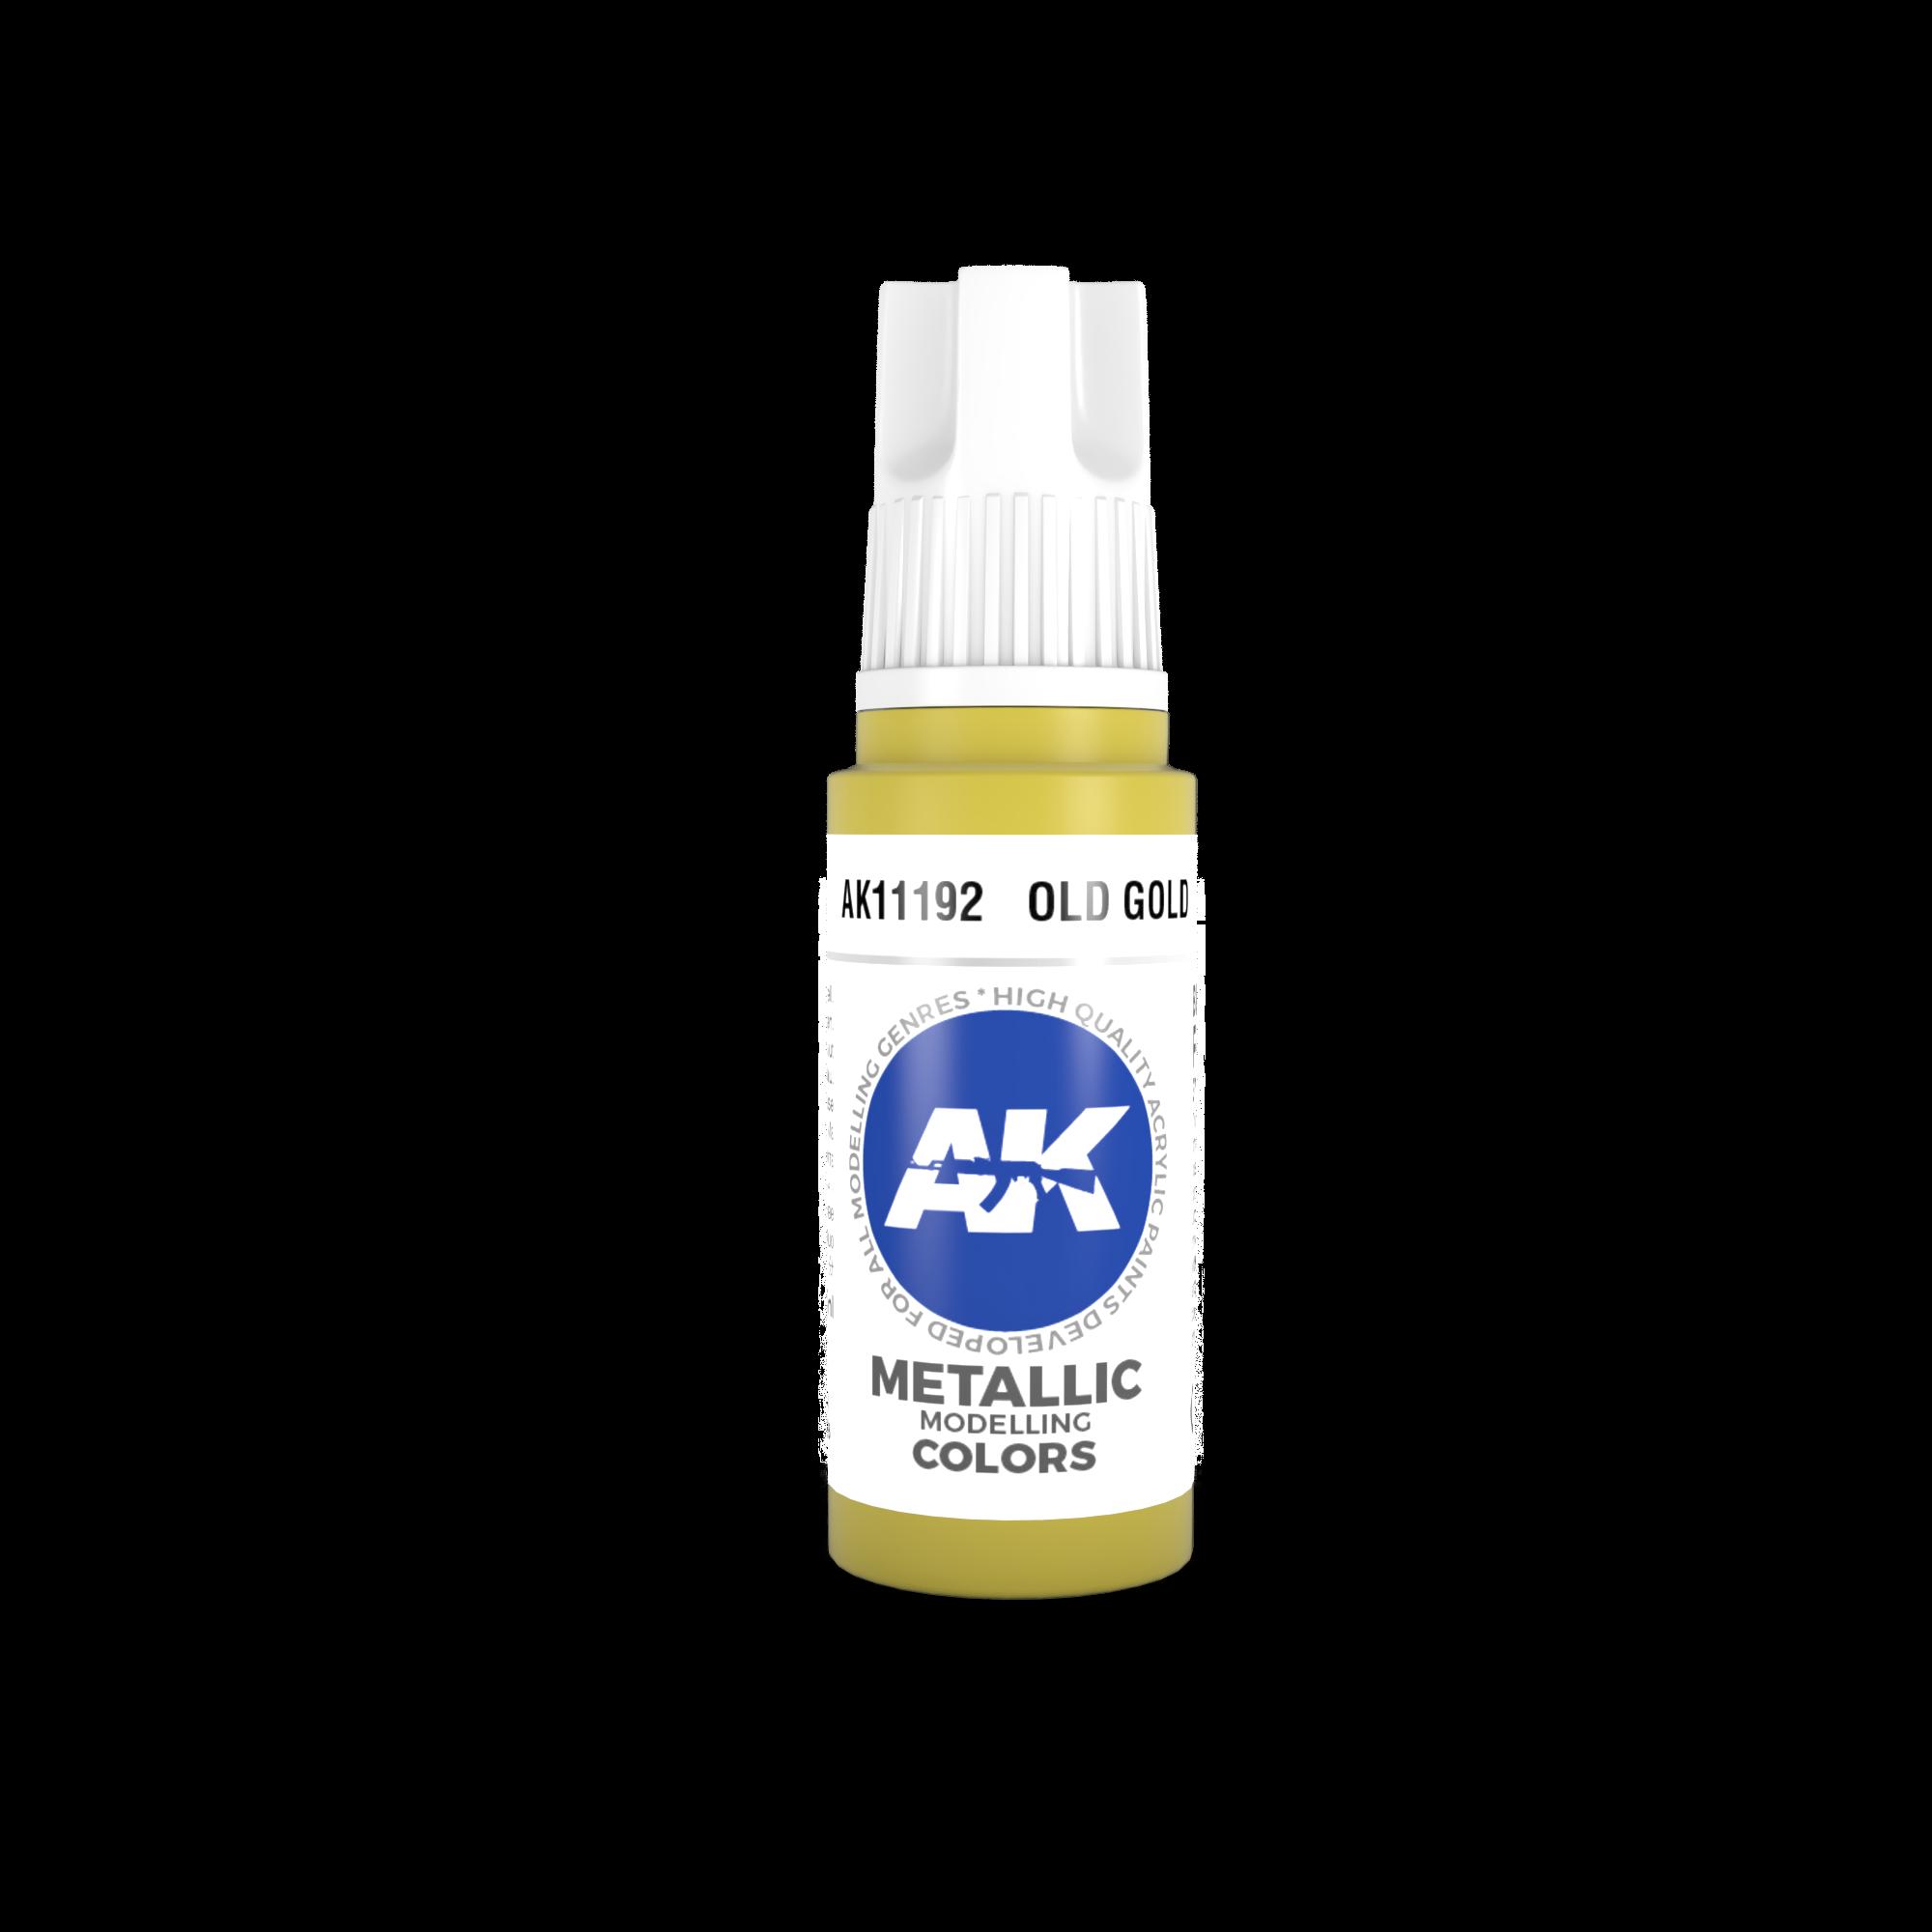 AK-Interactive Old Gold Acrylic Modelling Color - 17ml - AK-11192